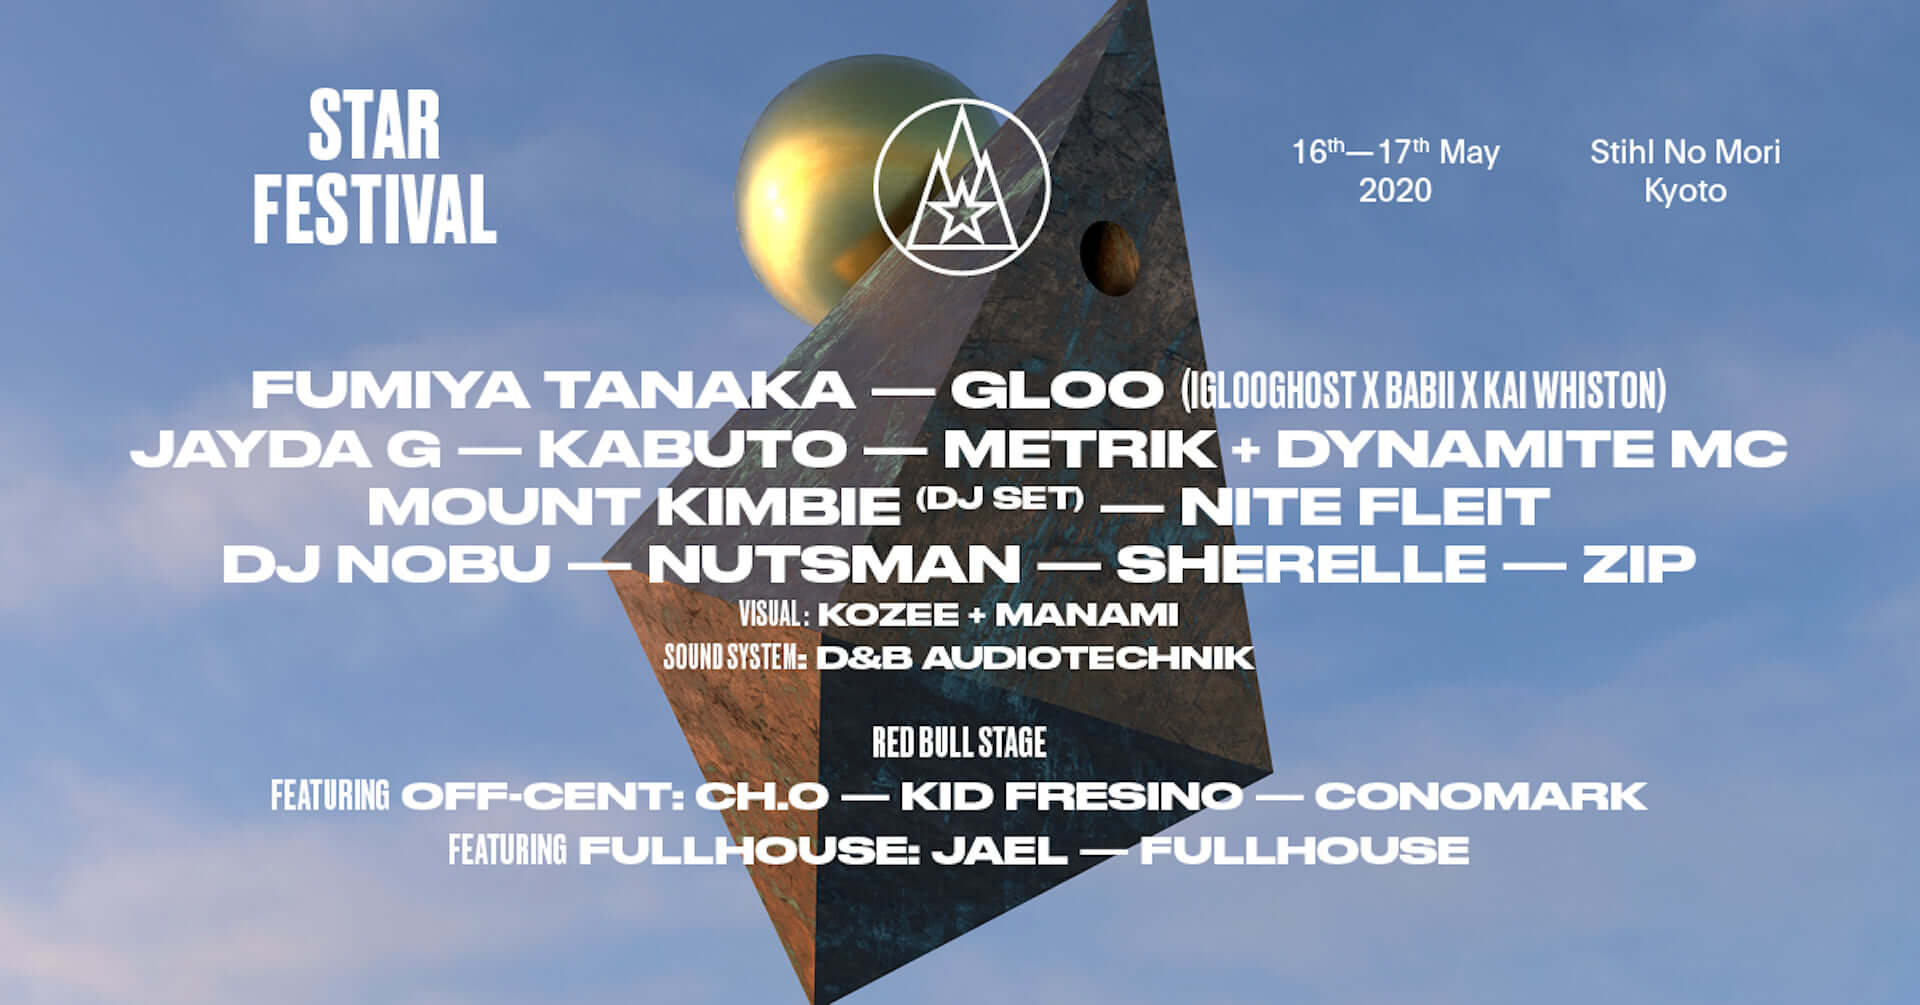 <Starfestival 2020>の追加アーティストが発表|Iglooghost率いるGLOO、DJ NOBU、KABUTO、METRIK、<OFF-CENT>、<FULLHOUSE>が参加決定 music200311_starfes_10-1920x1005